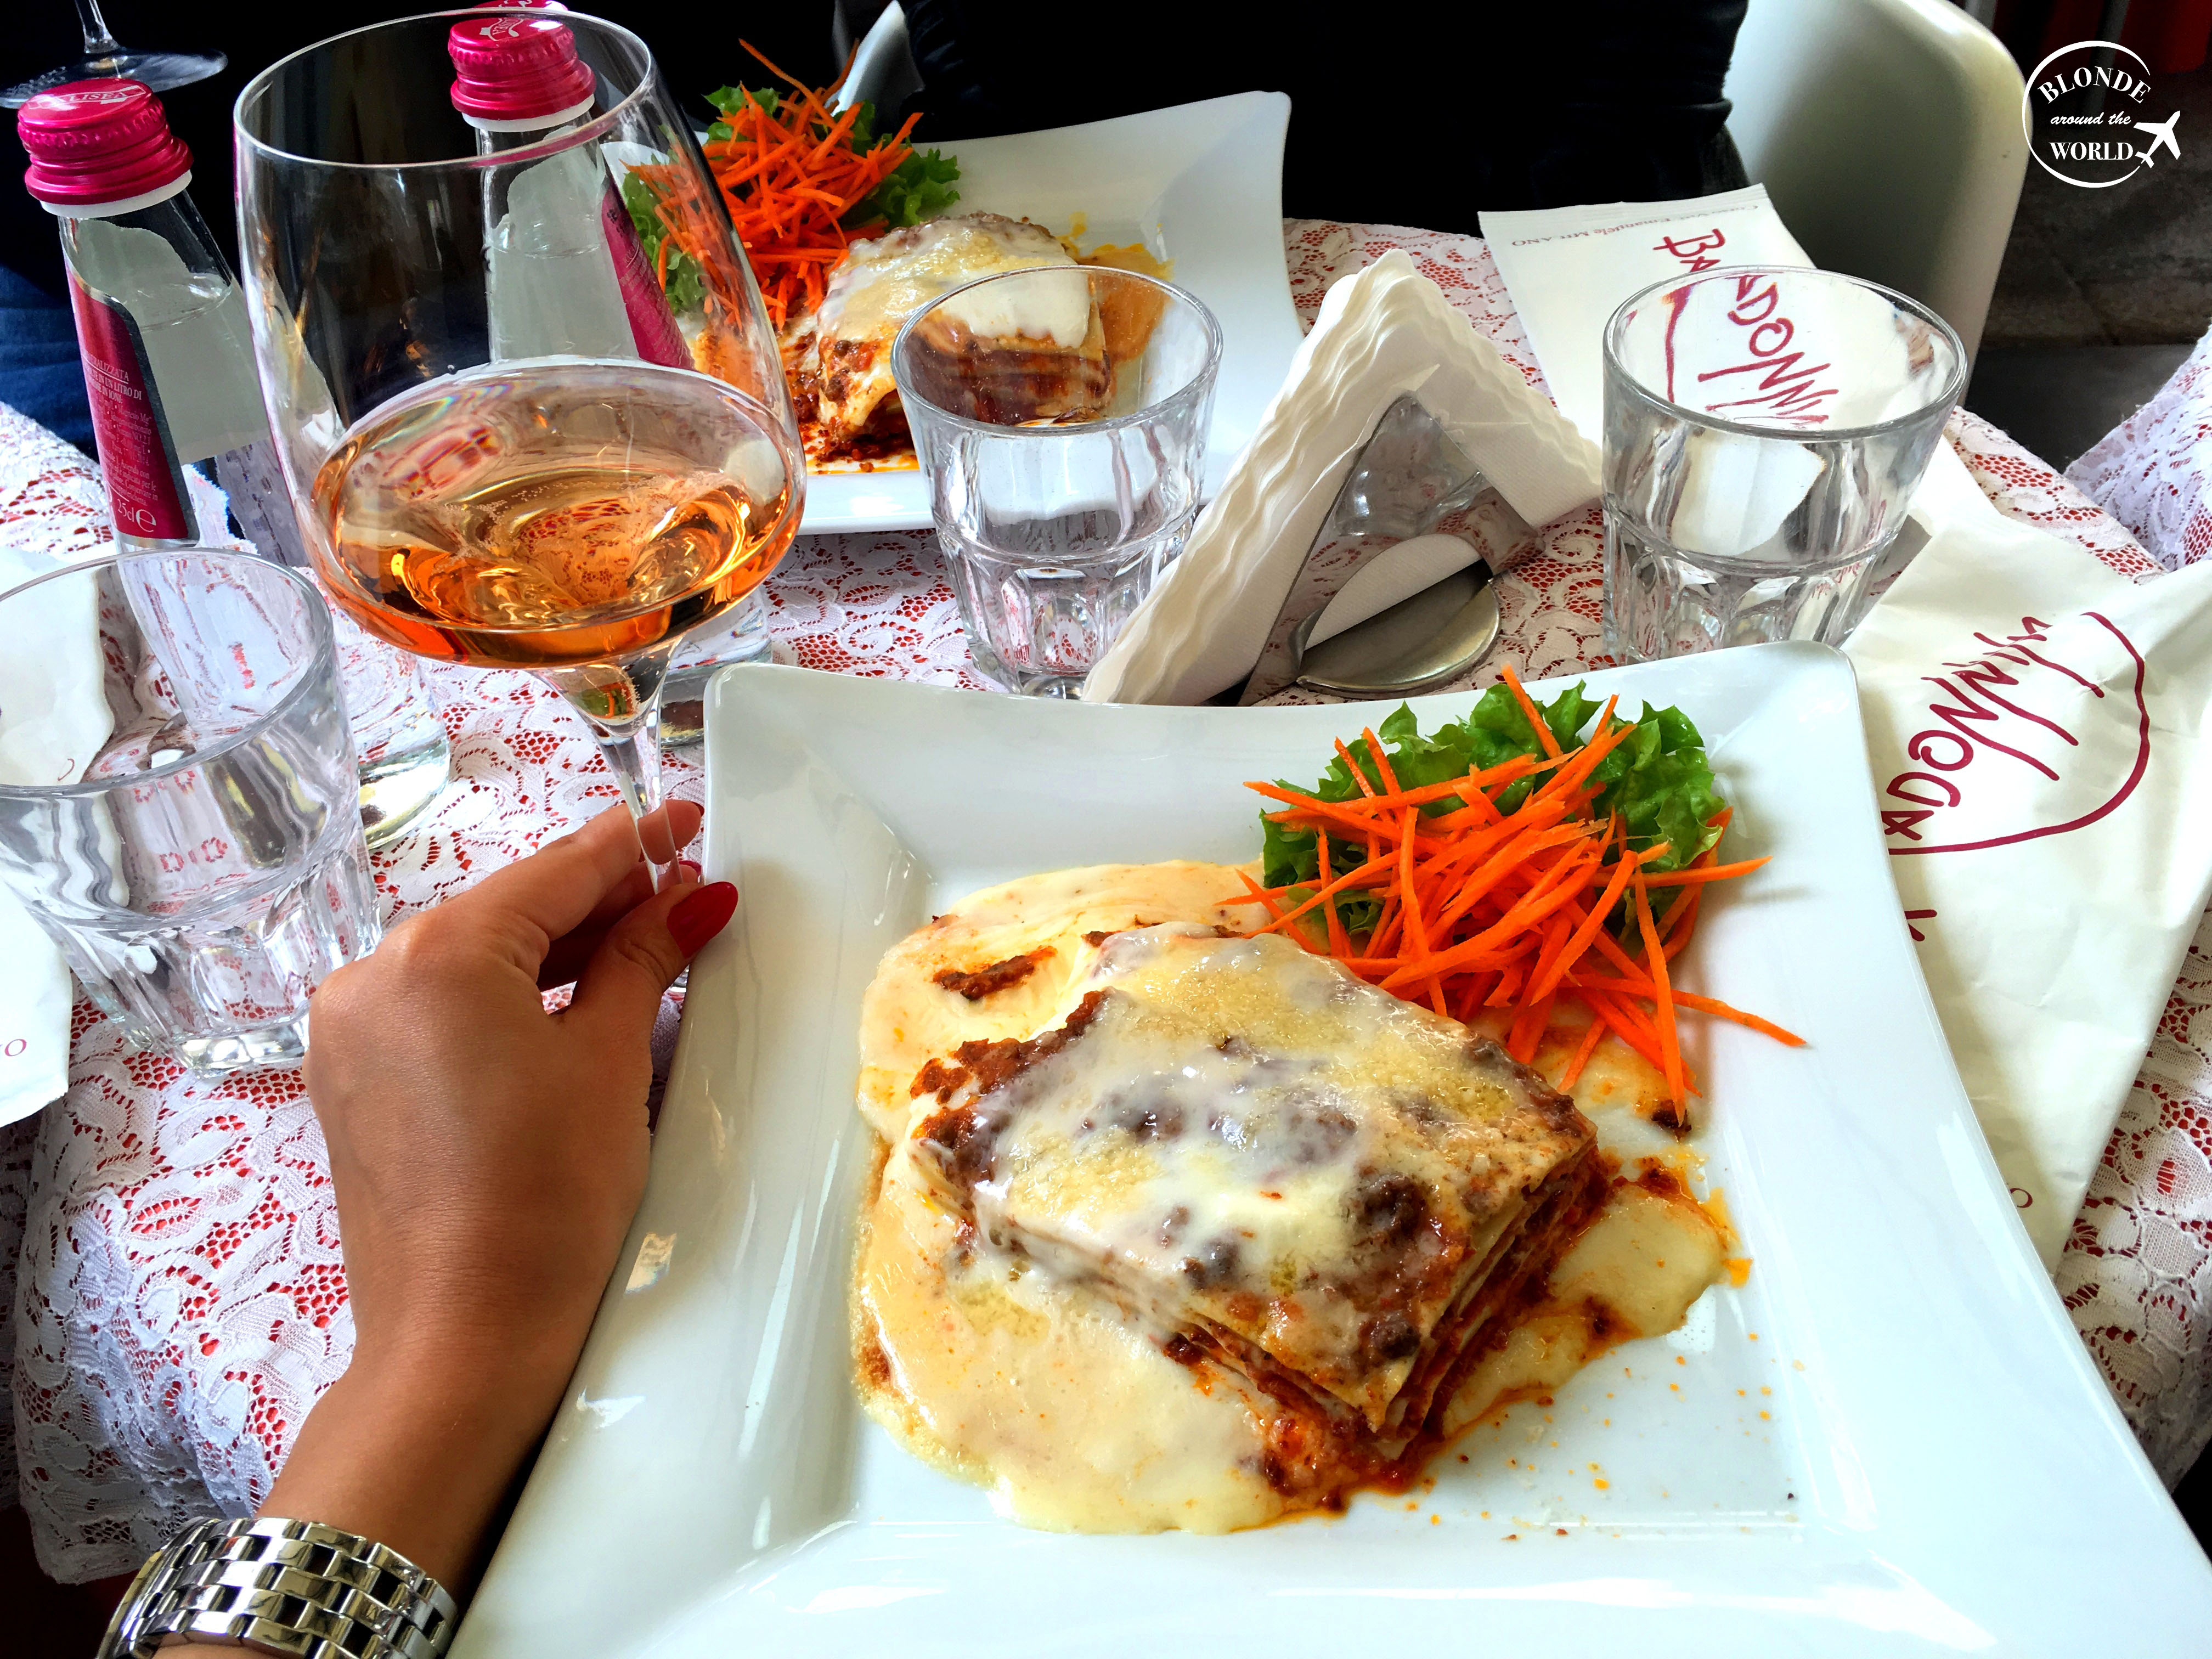 milan-lasagna.jpg